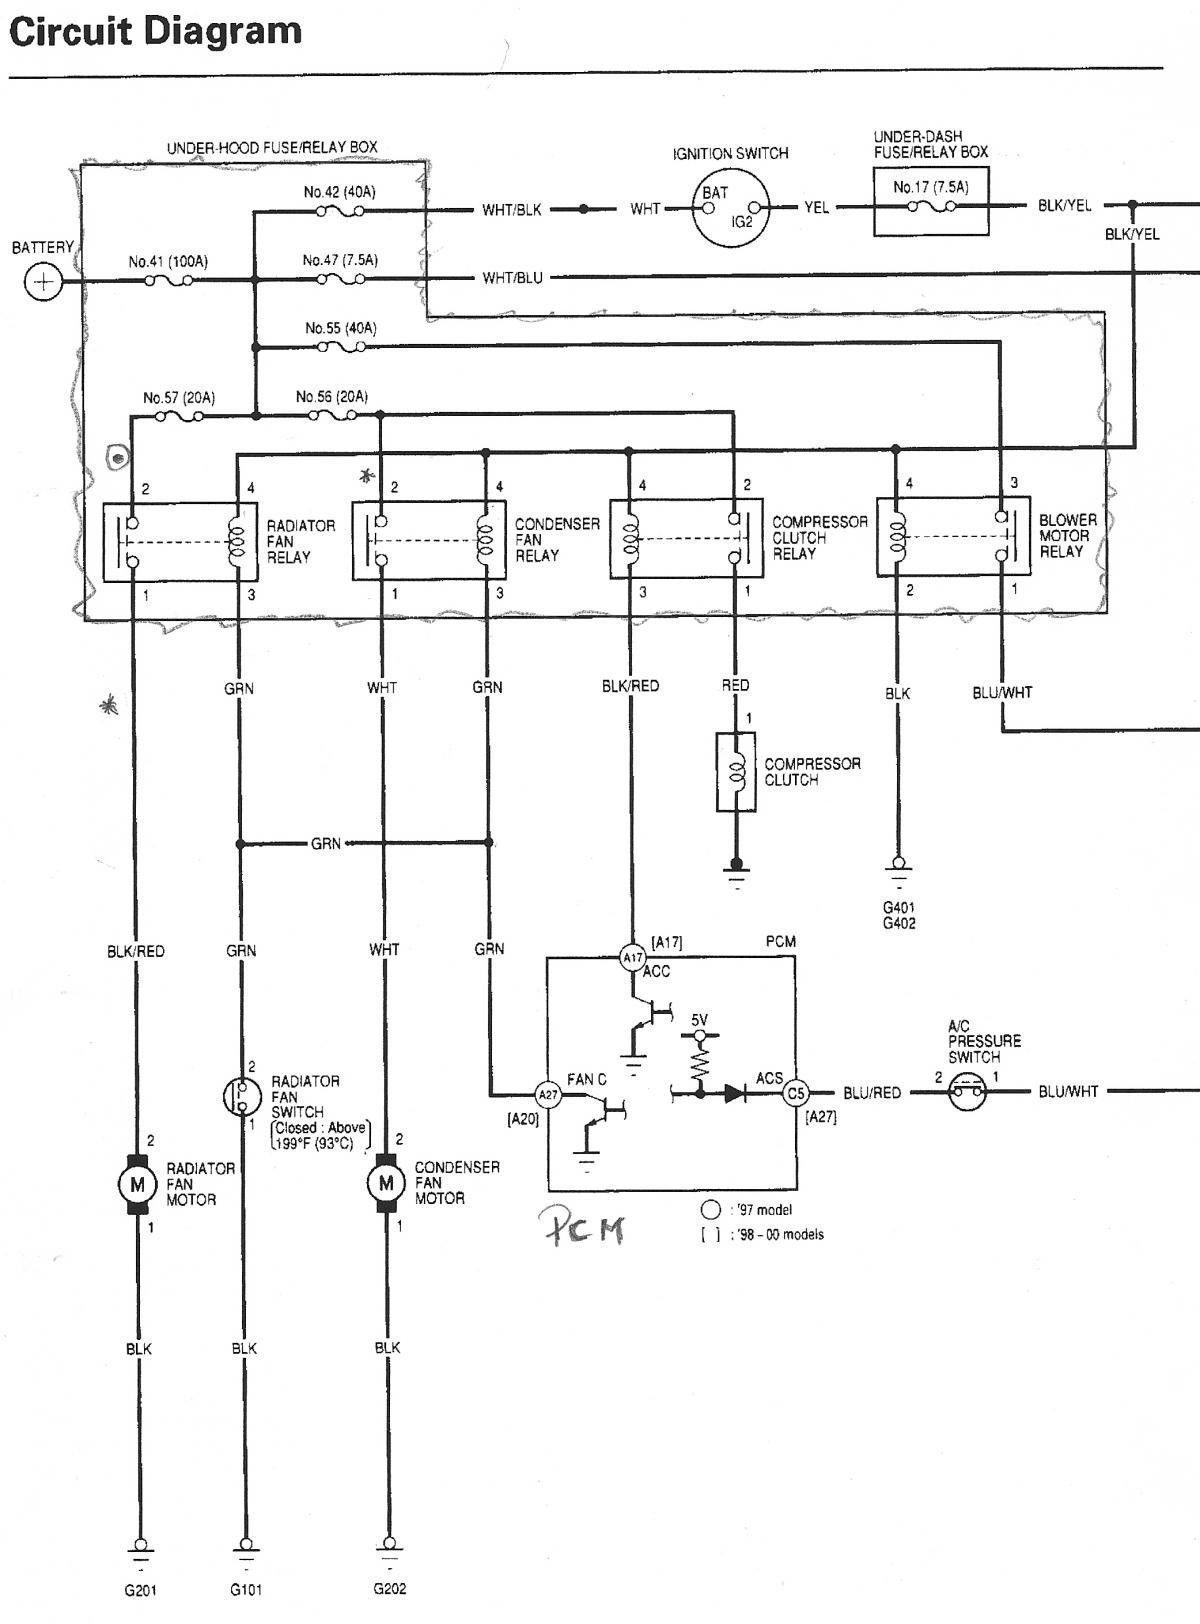 New Chrysler Electric Fan Wiring Diagram Honda Accord Honda Crv Diagram